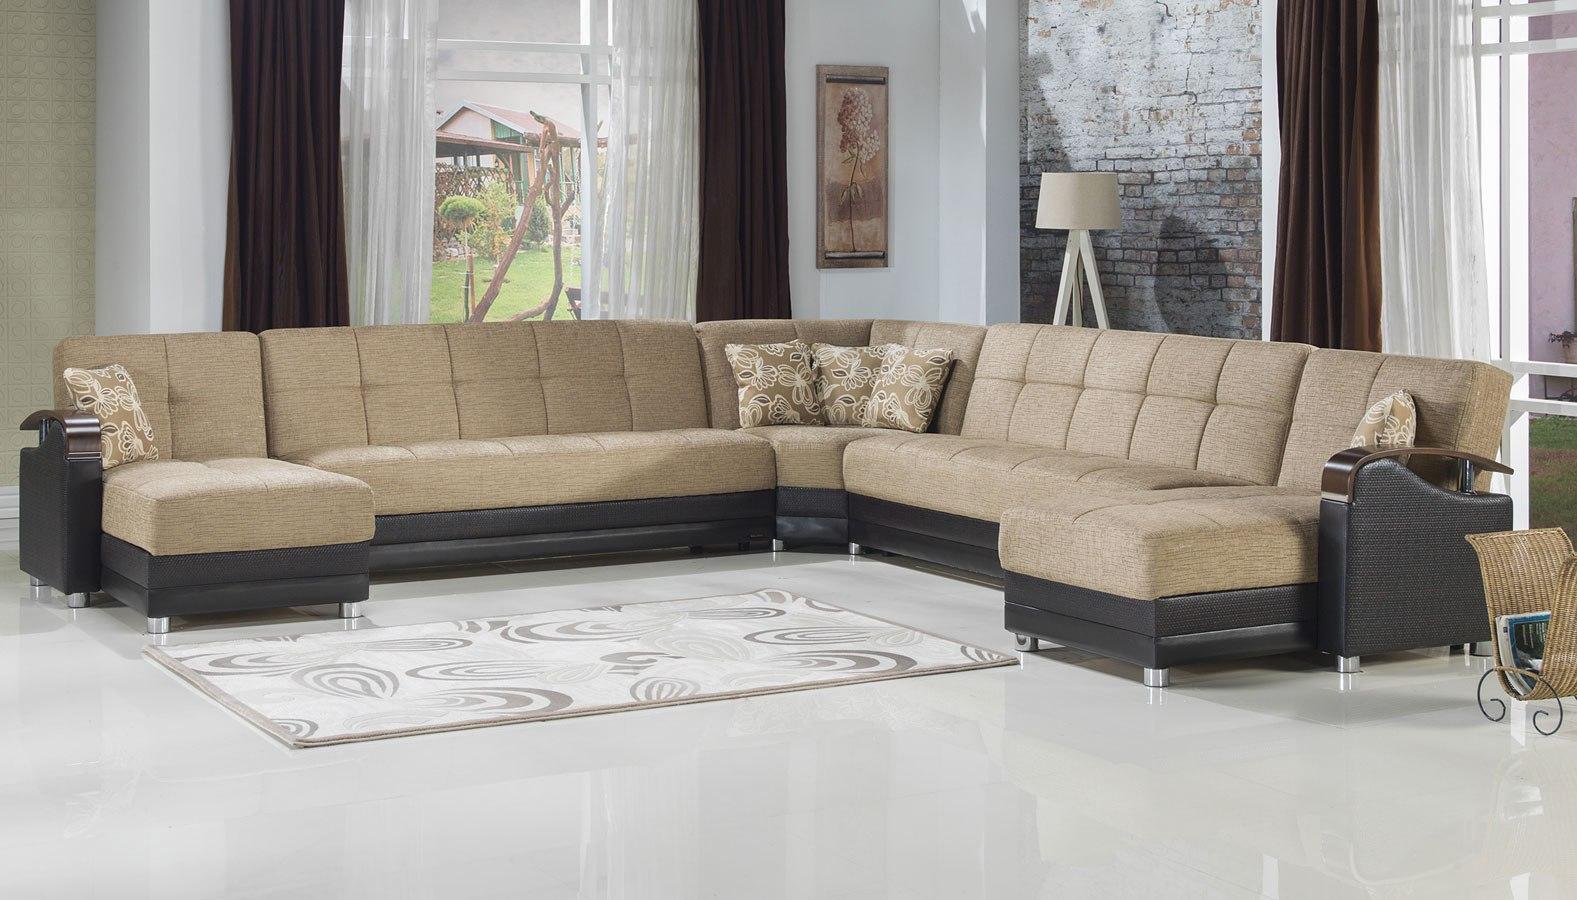 Luna Modular Sectional Fulya Brown Istikbal Furniture